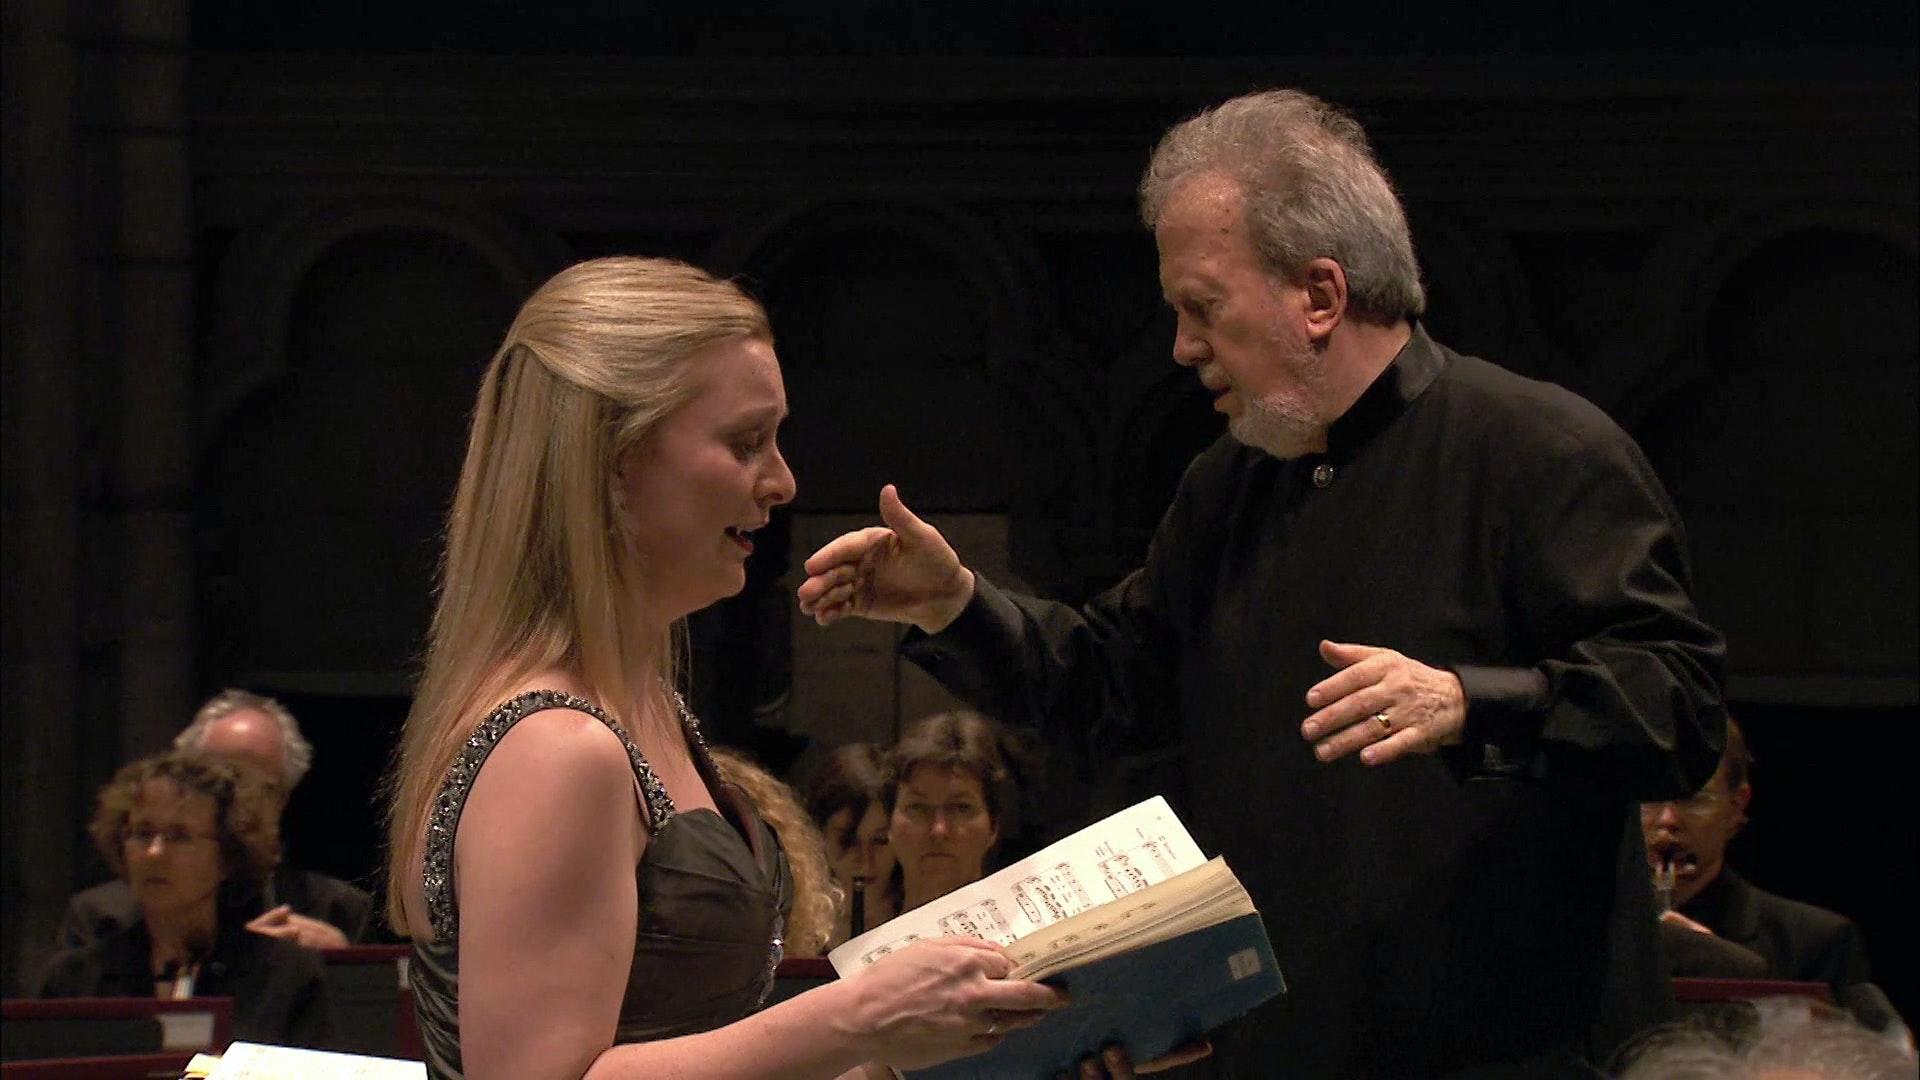 John Nelson conducts Johann Sebastian Bach's St Matthew Passion